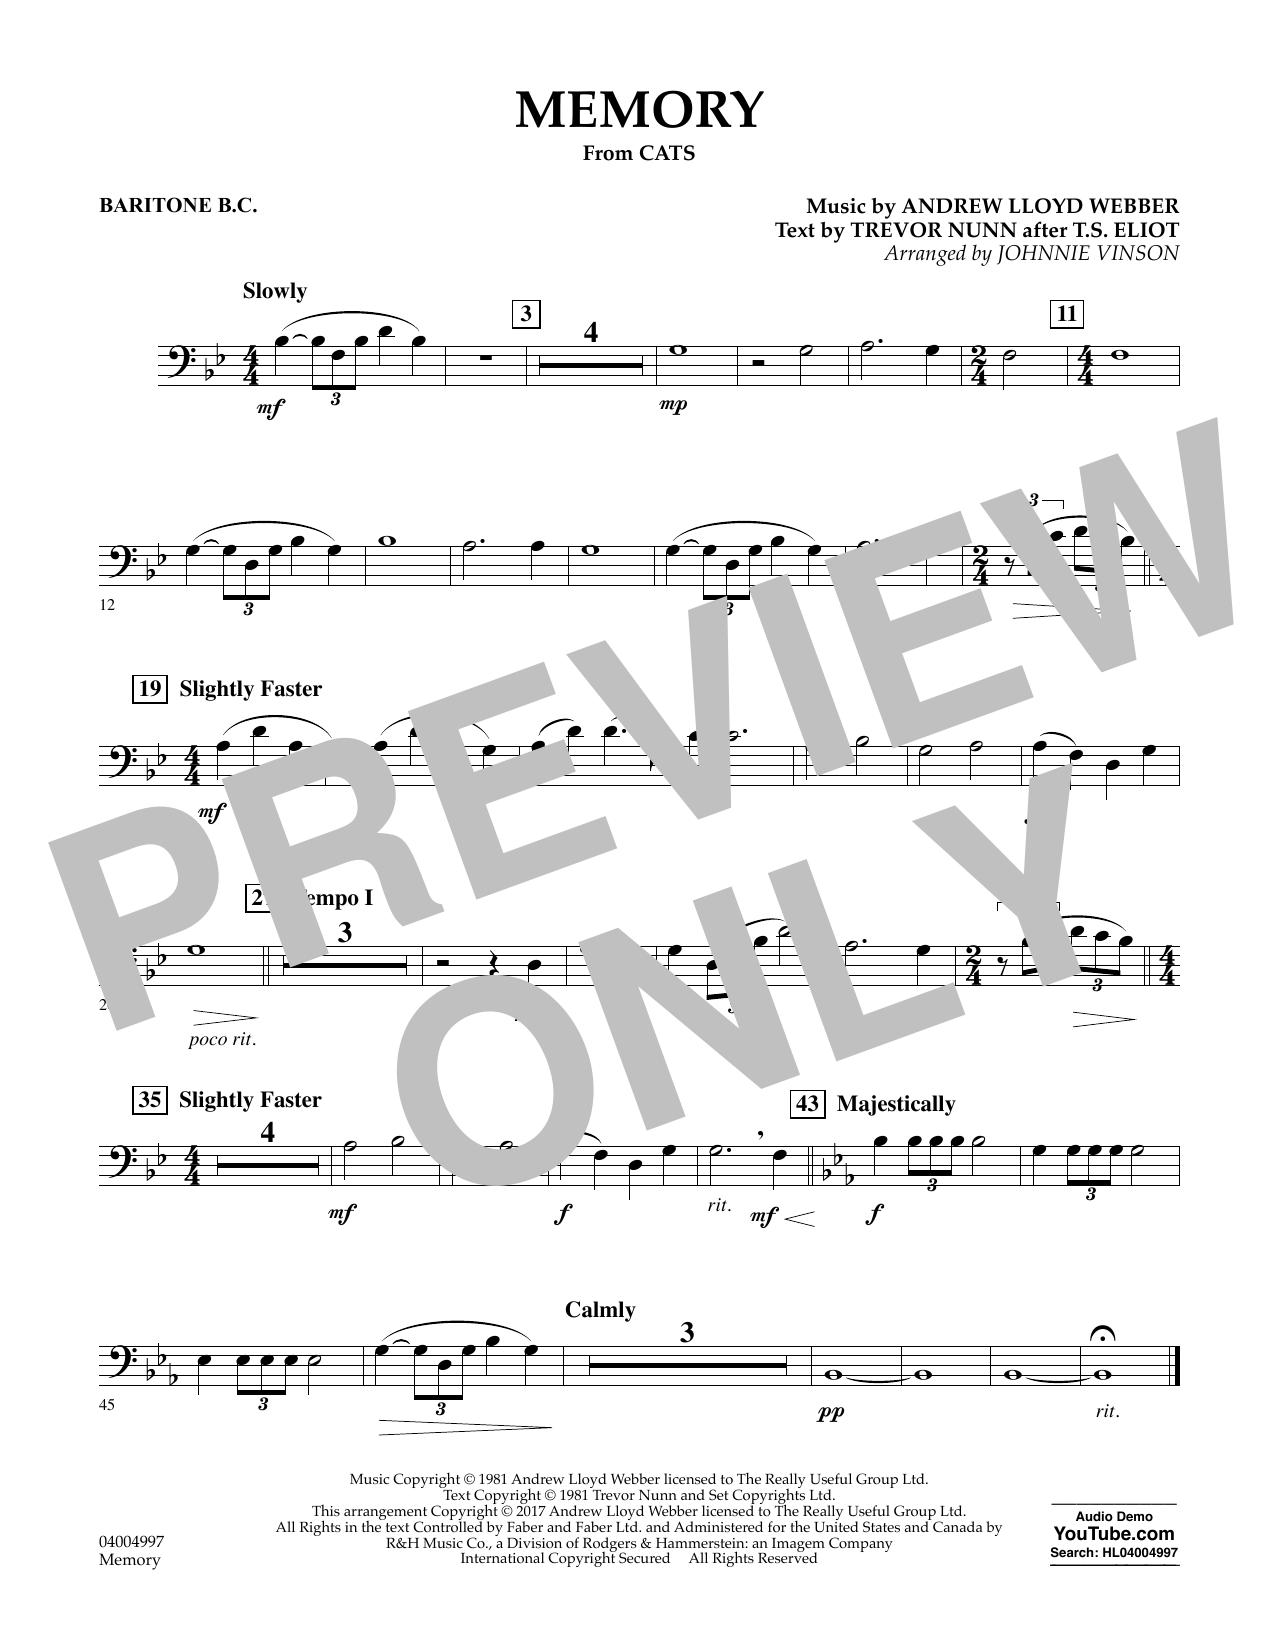 Memory (from Cats) (arr. Johnnie Vinson) - Baritone B.C. Sheet Music